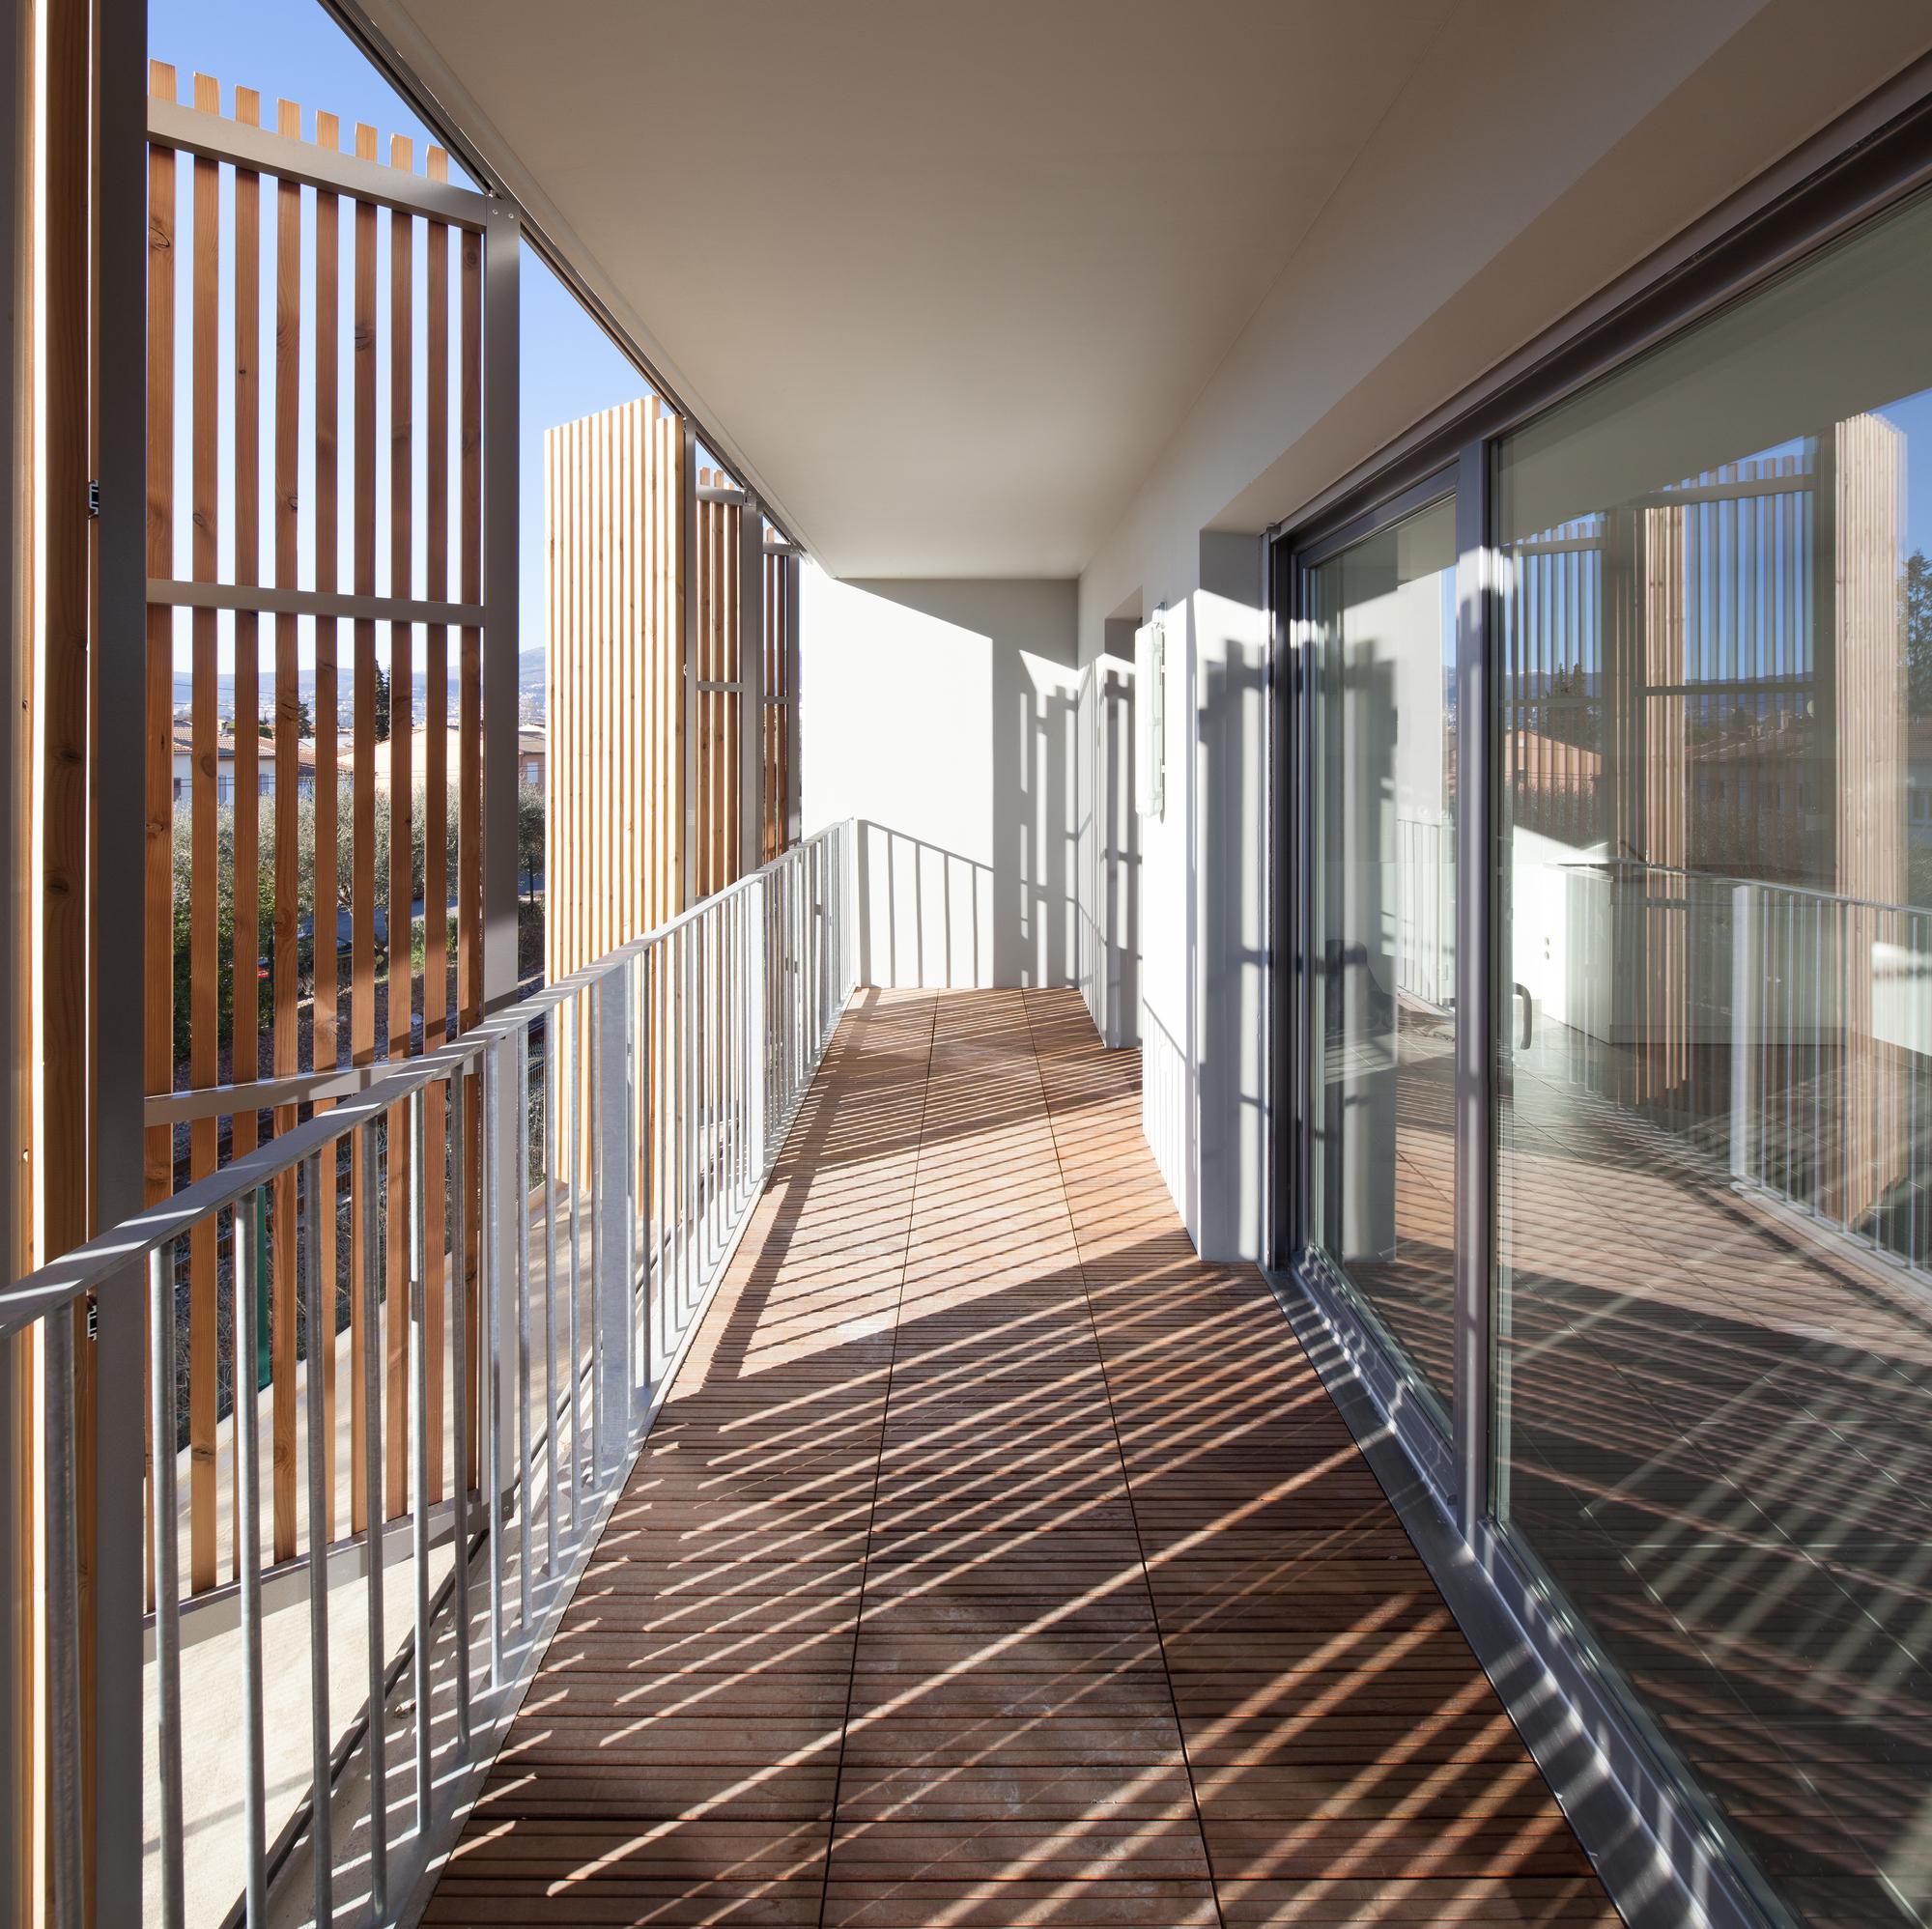 gallery of social housing shops in mouans sartoux comte et vollenweider architectes 23. Black Bedroom Furniture Sets. Home Design Ideas